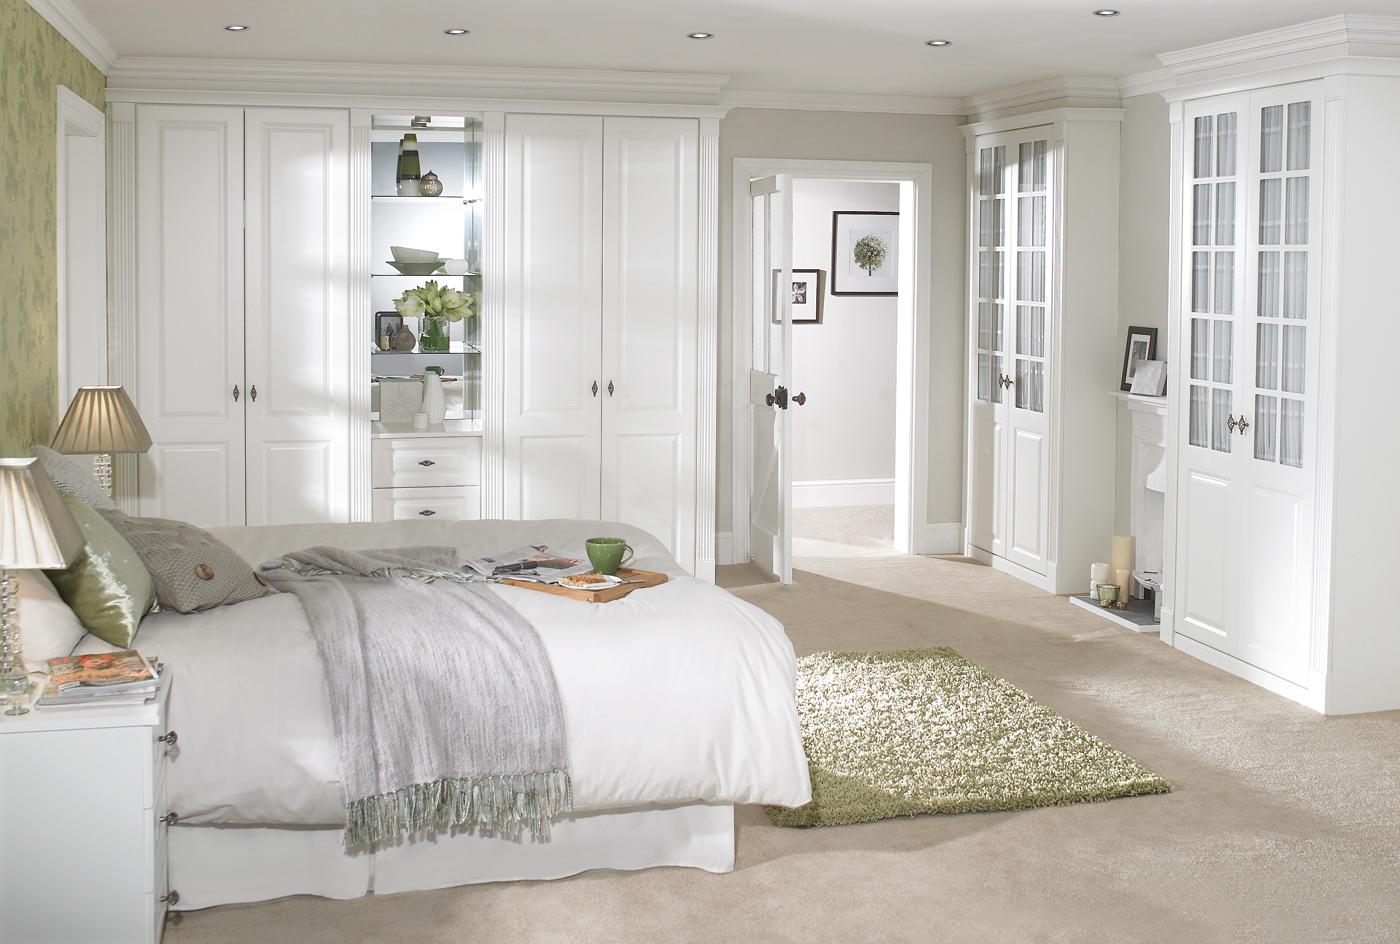 Standard closet size bedroom